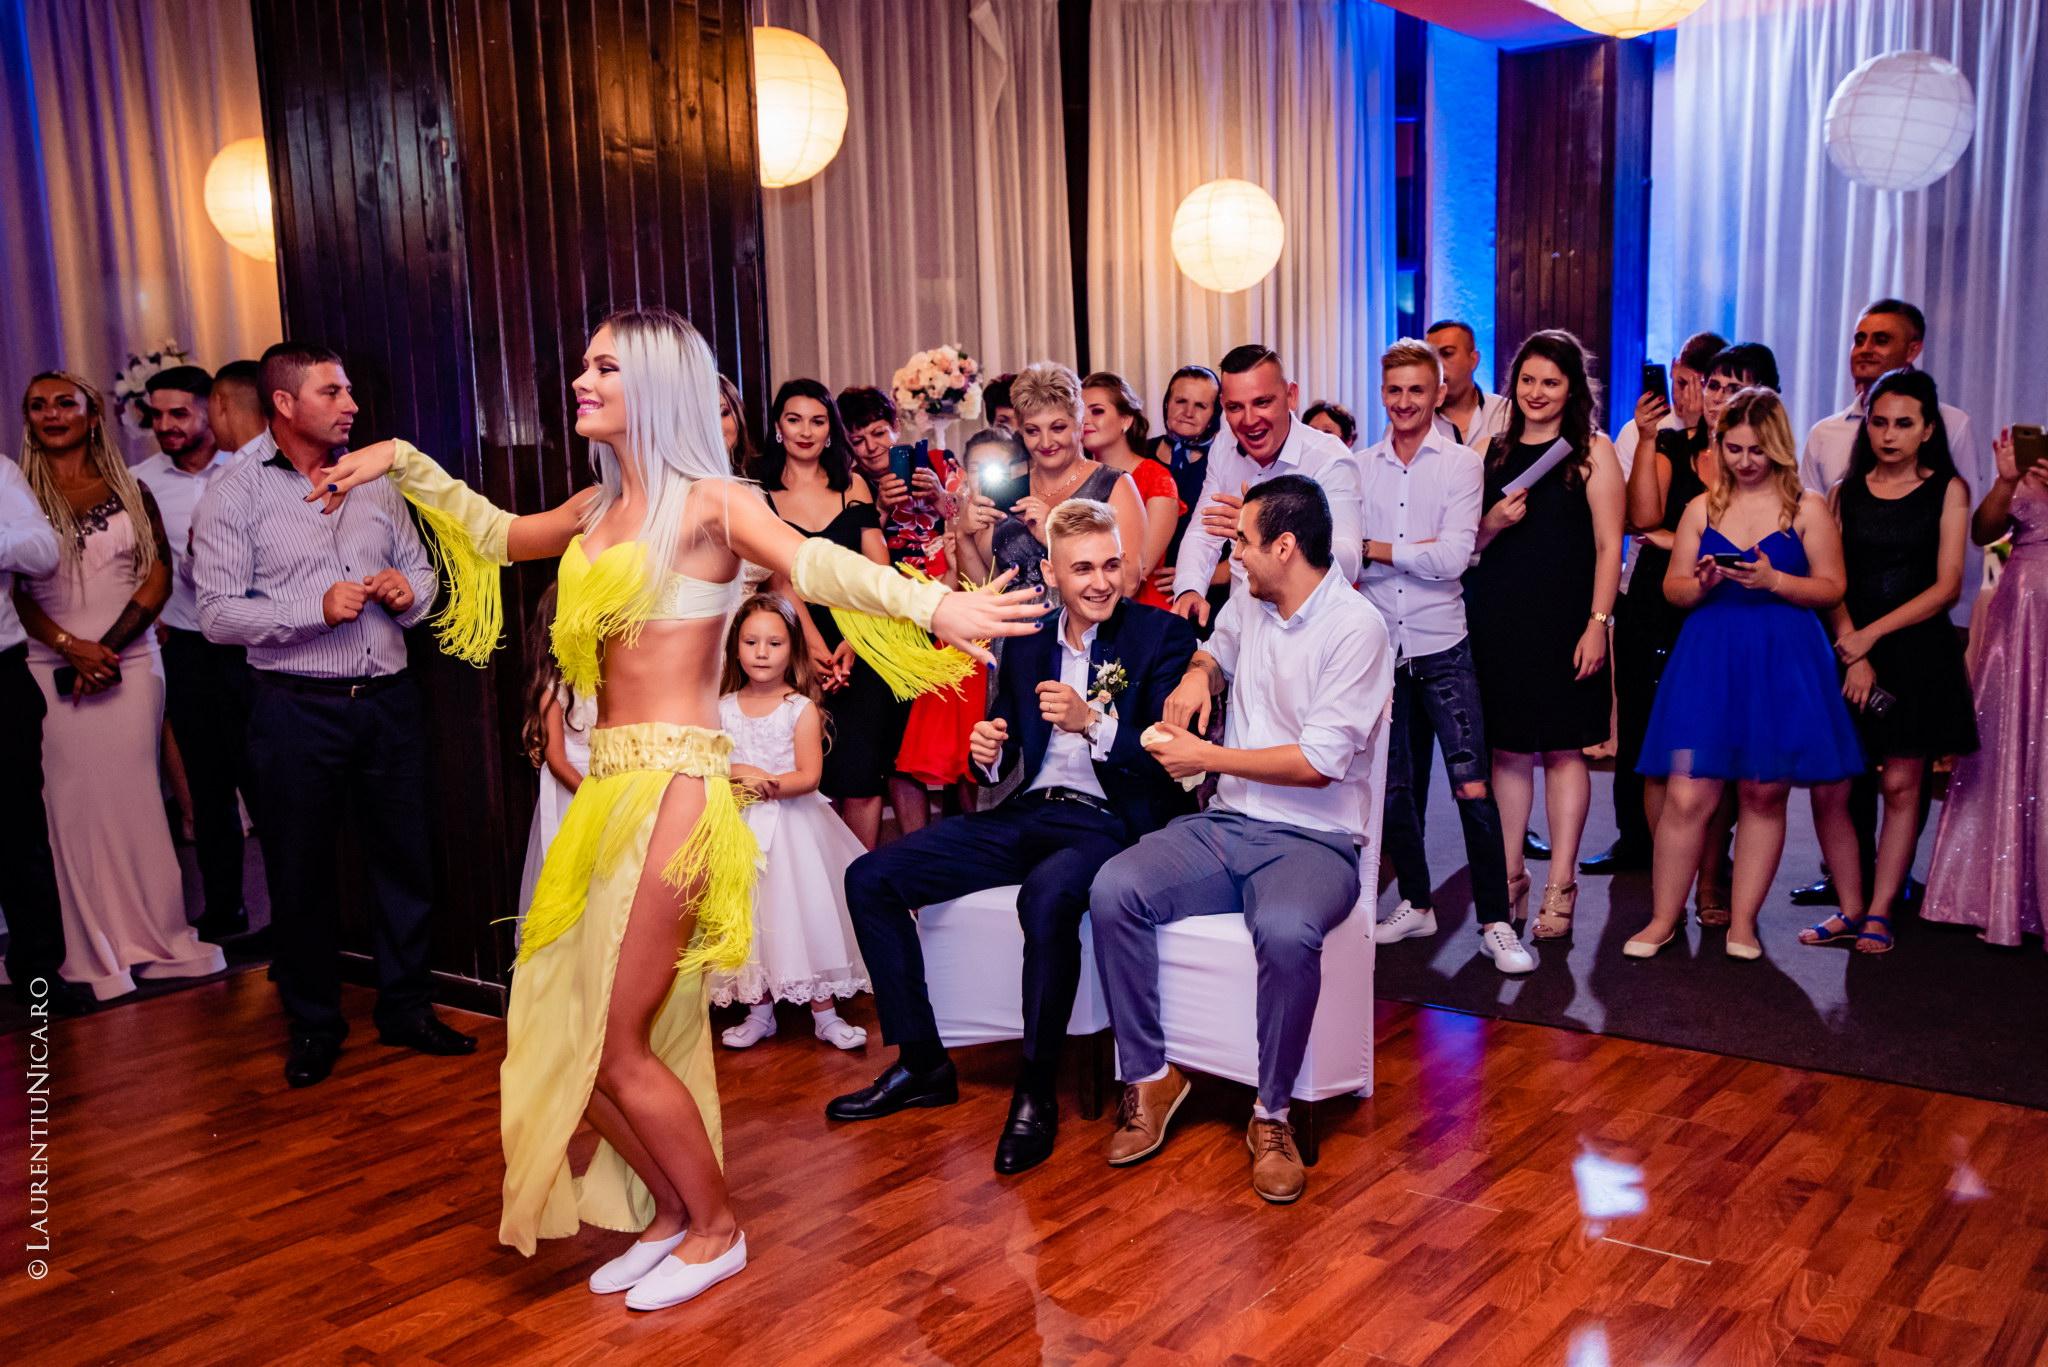 fotografii nunta Roxana si Cosmin fotograf nunta laurentiu nica 41 - Roxana & Cosmin | Fotografii nunta | Ticleni, judetul Gorj